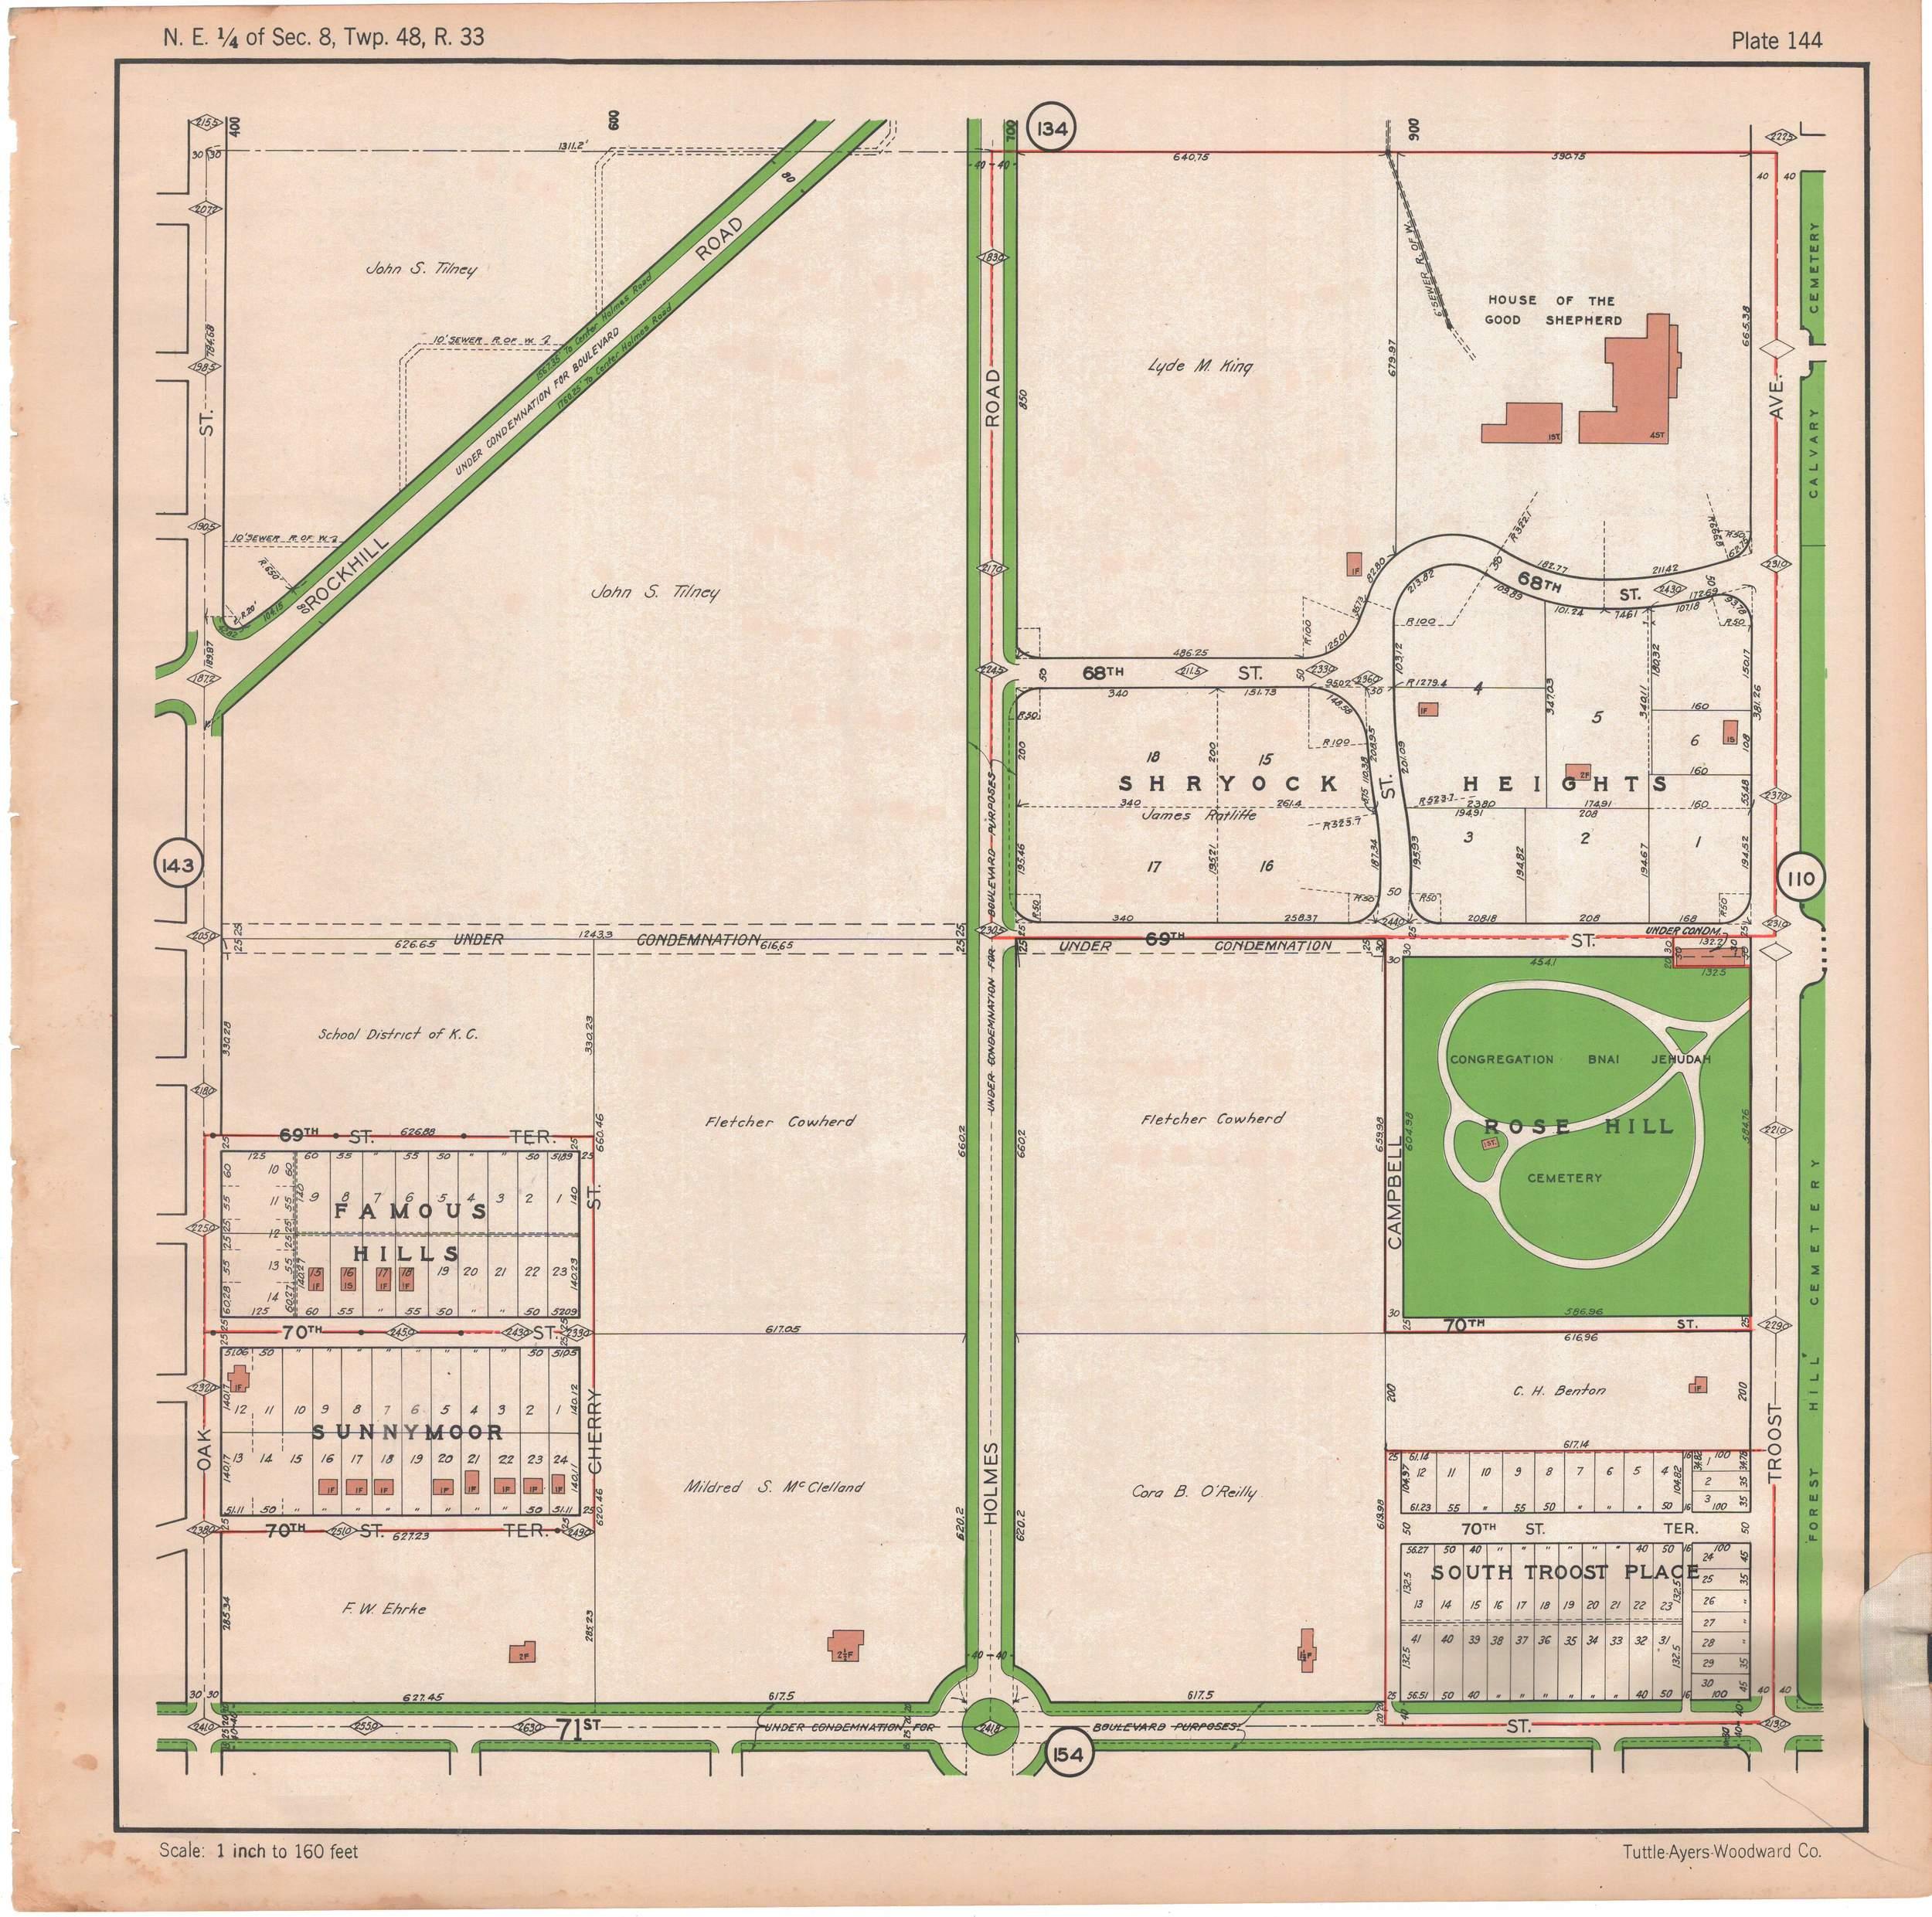 1925 TUTTLE_AYERS_Plate_144.JPG